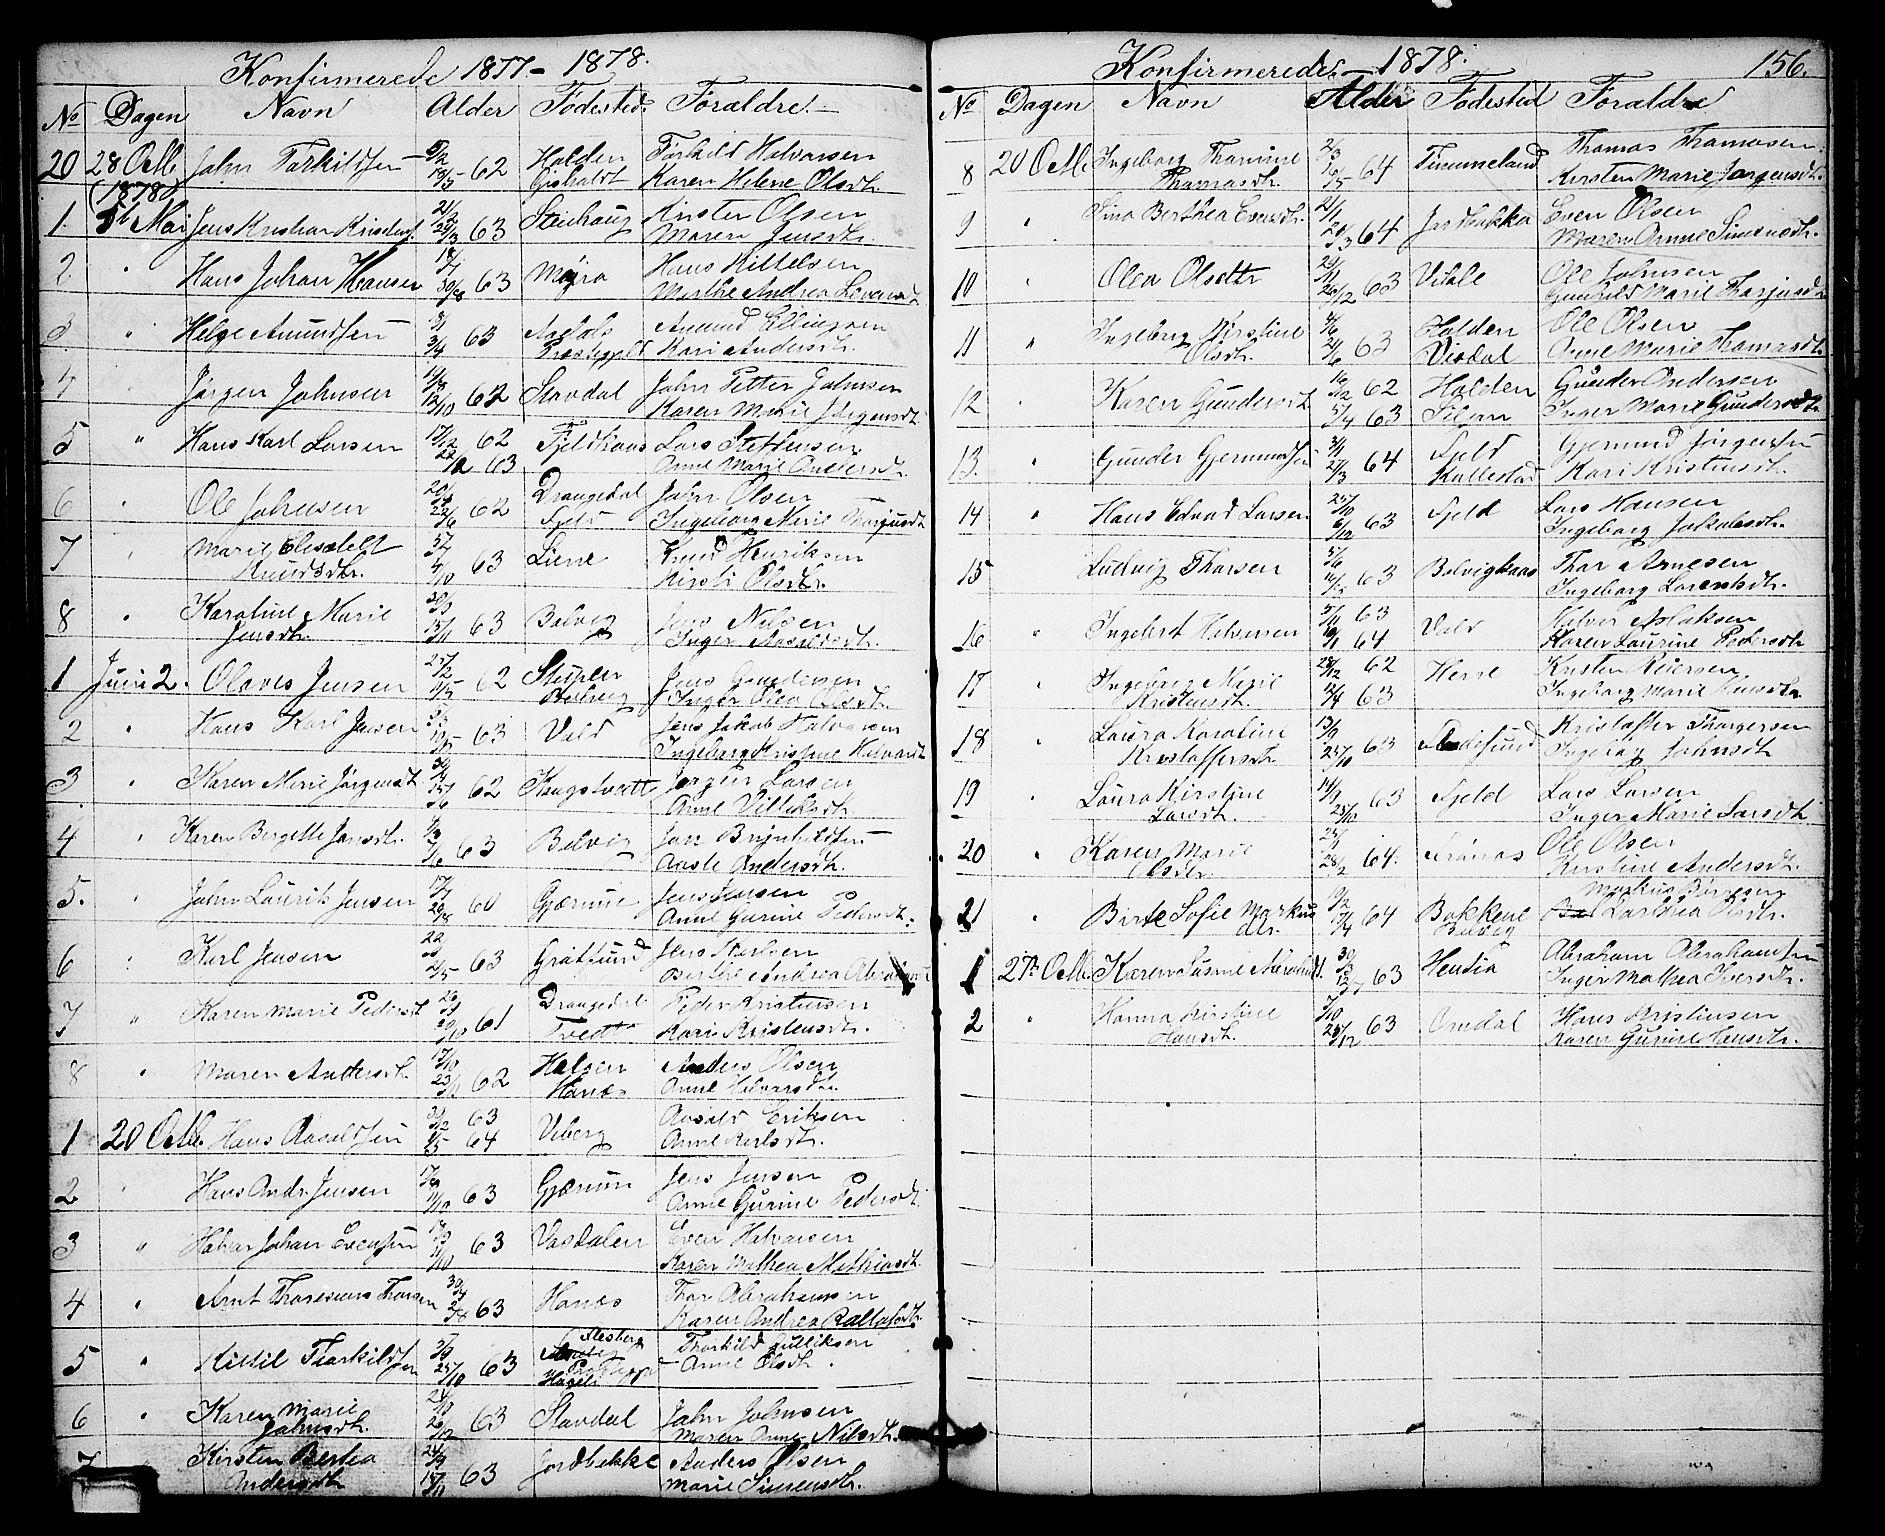 SAKO, Solum kirkebøker, G/Gb/L0002: Klokkerbok nr. II 2, 1859-1879, s. 156